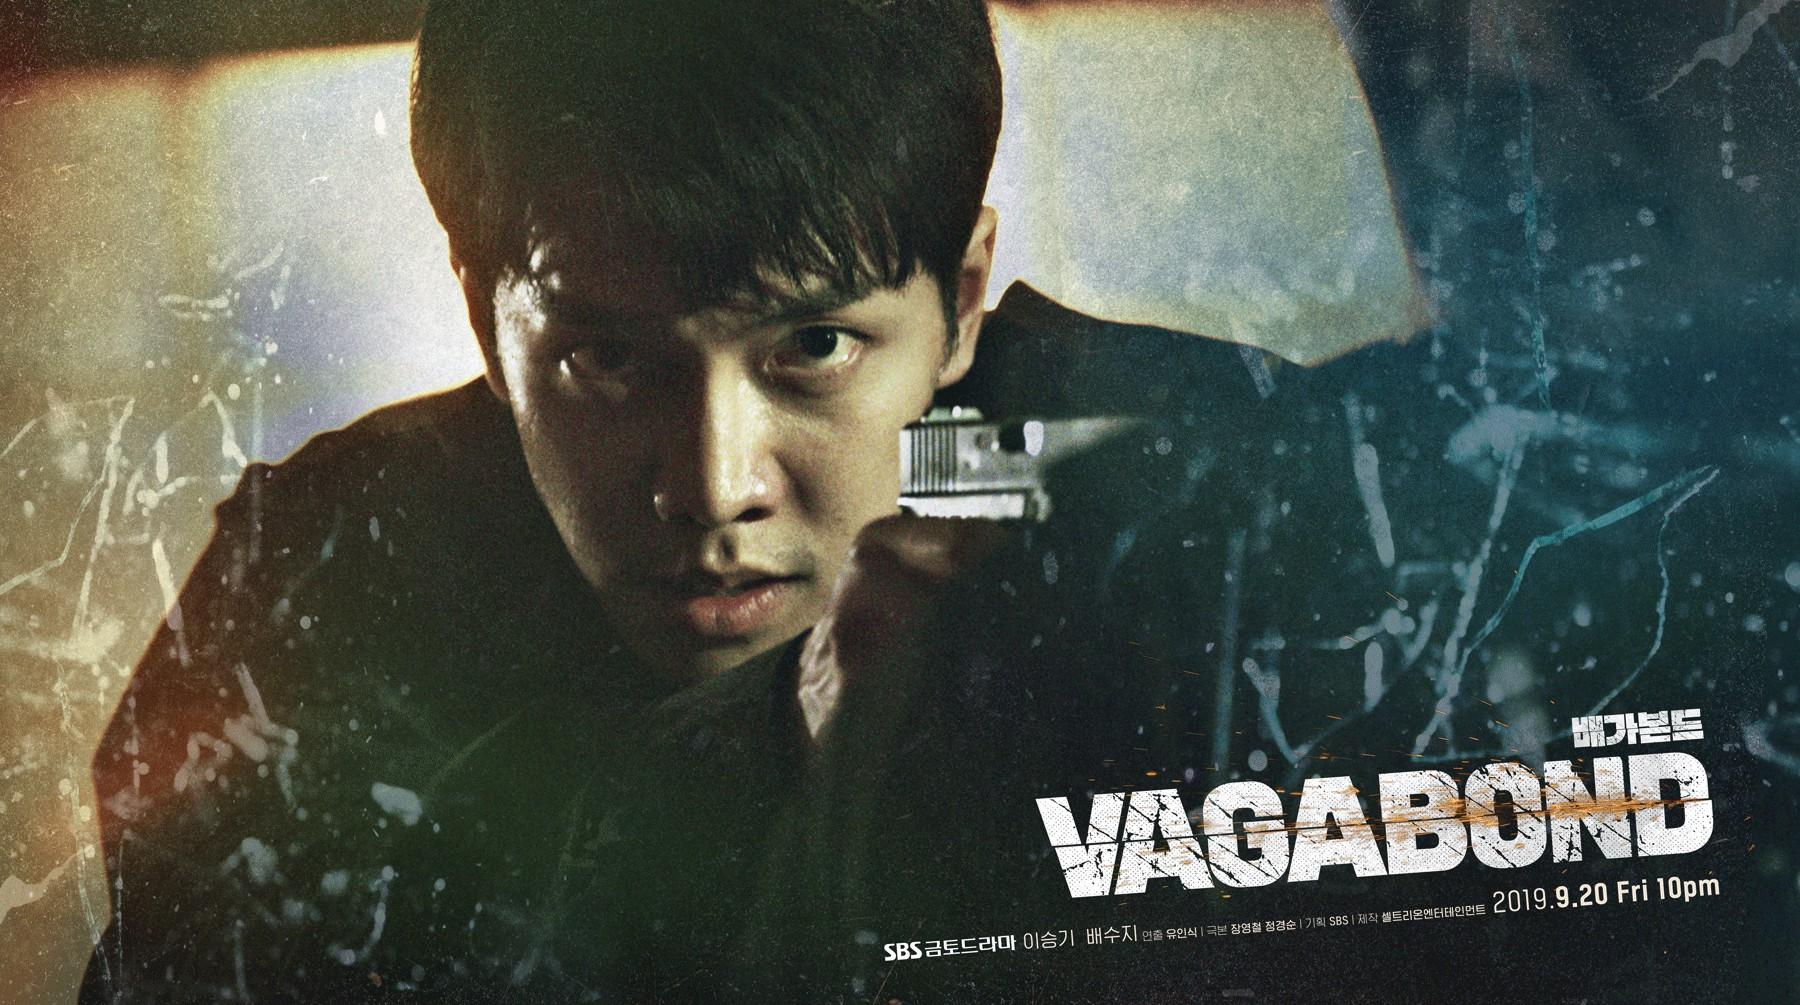 Vagabond | Wiki Drama | Fandom